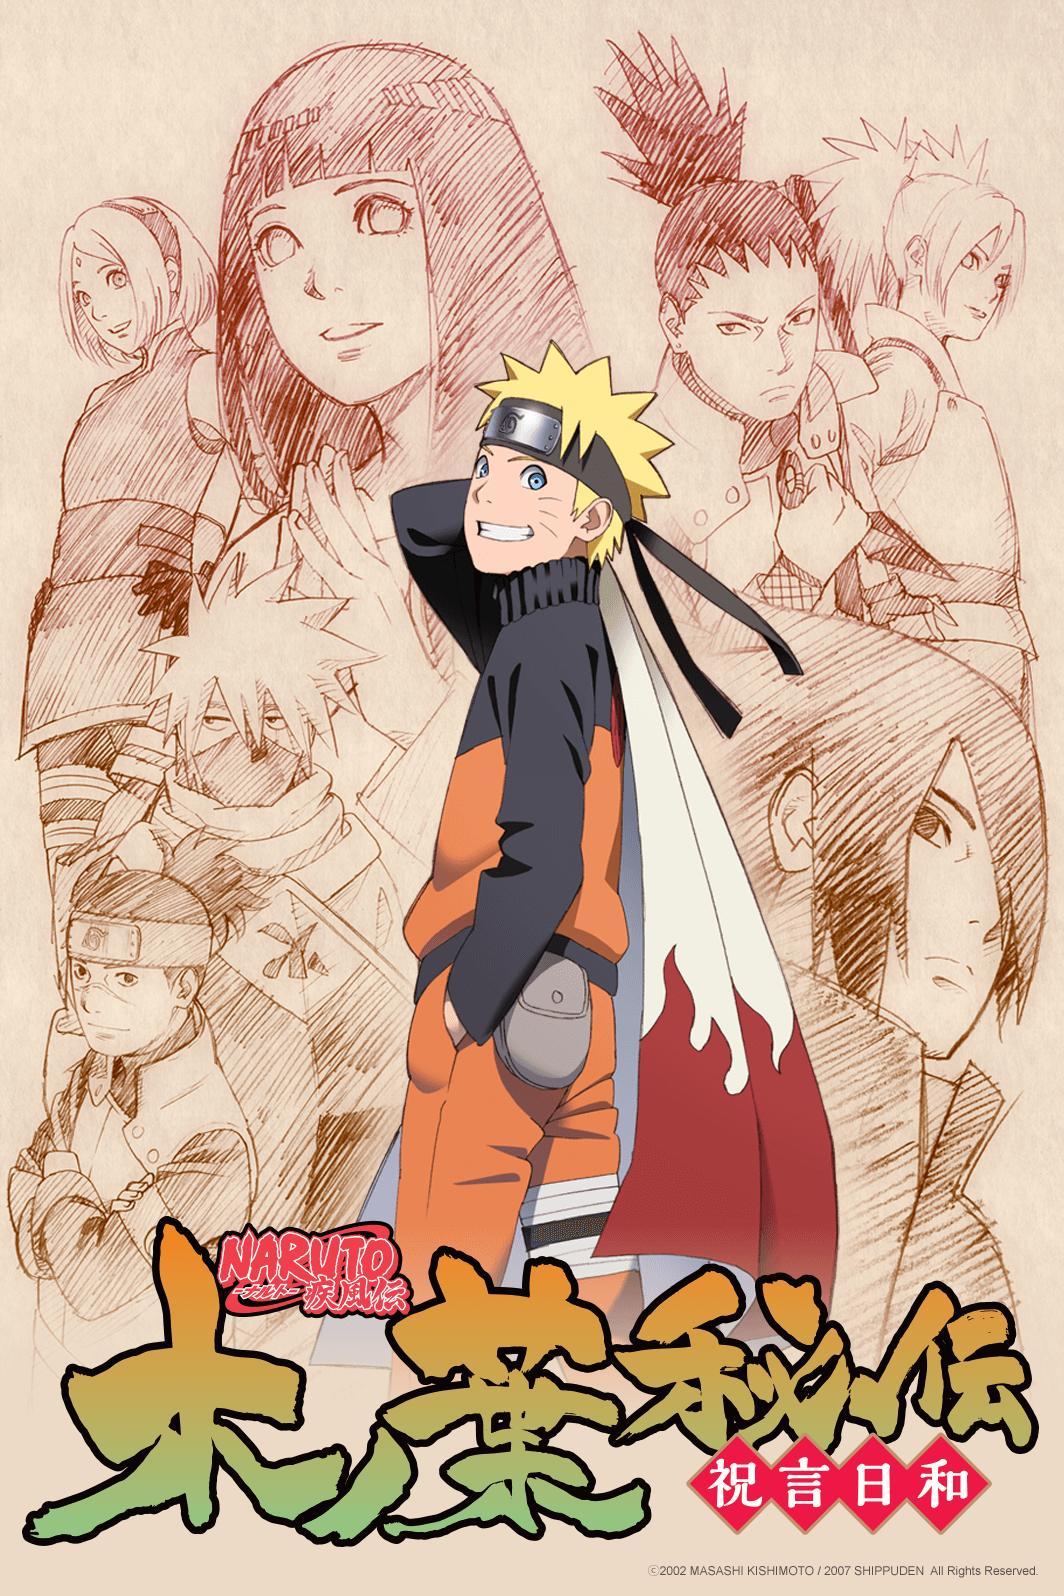 Naruto Shippuden - Watch on Crunchyroll